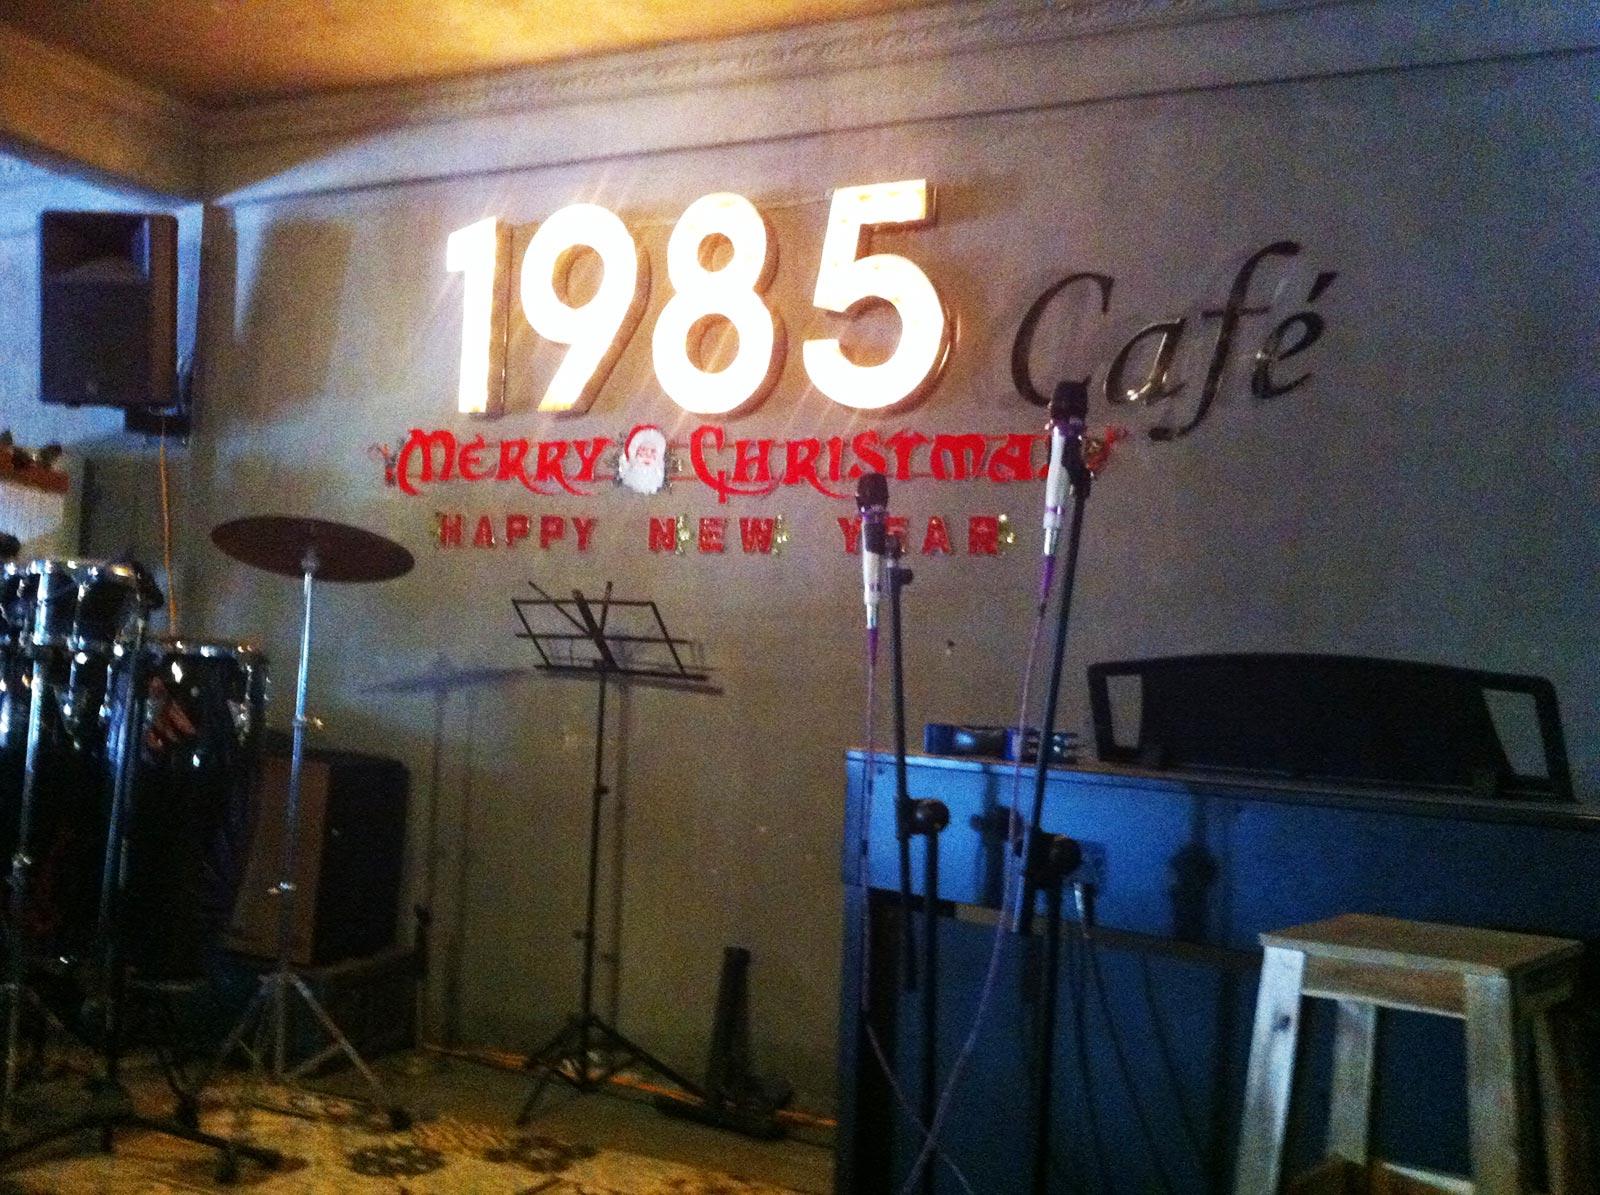 Can Tho 1985 Café